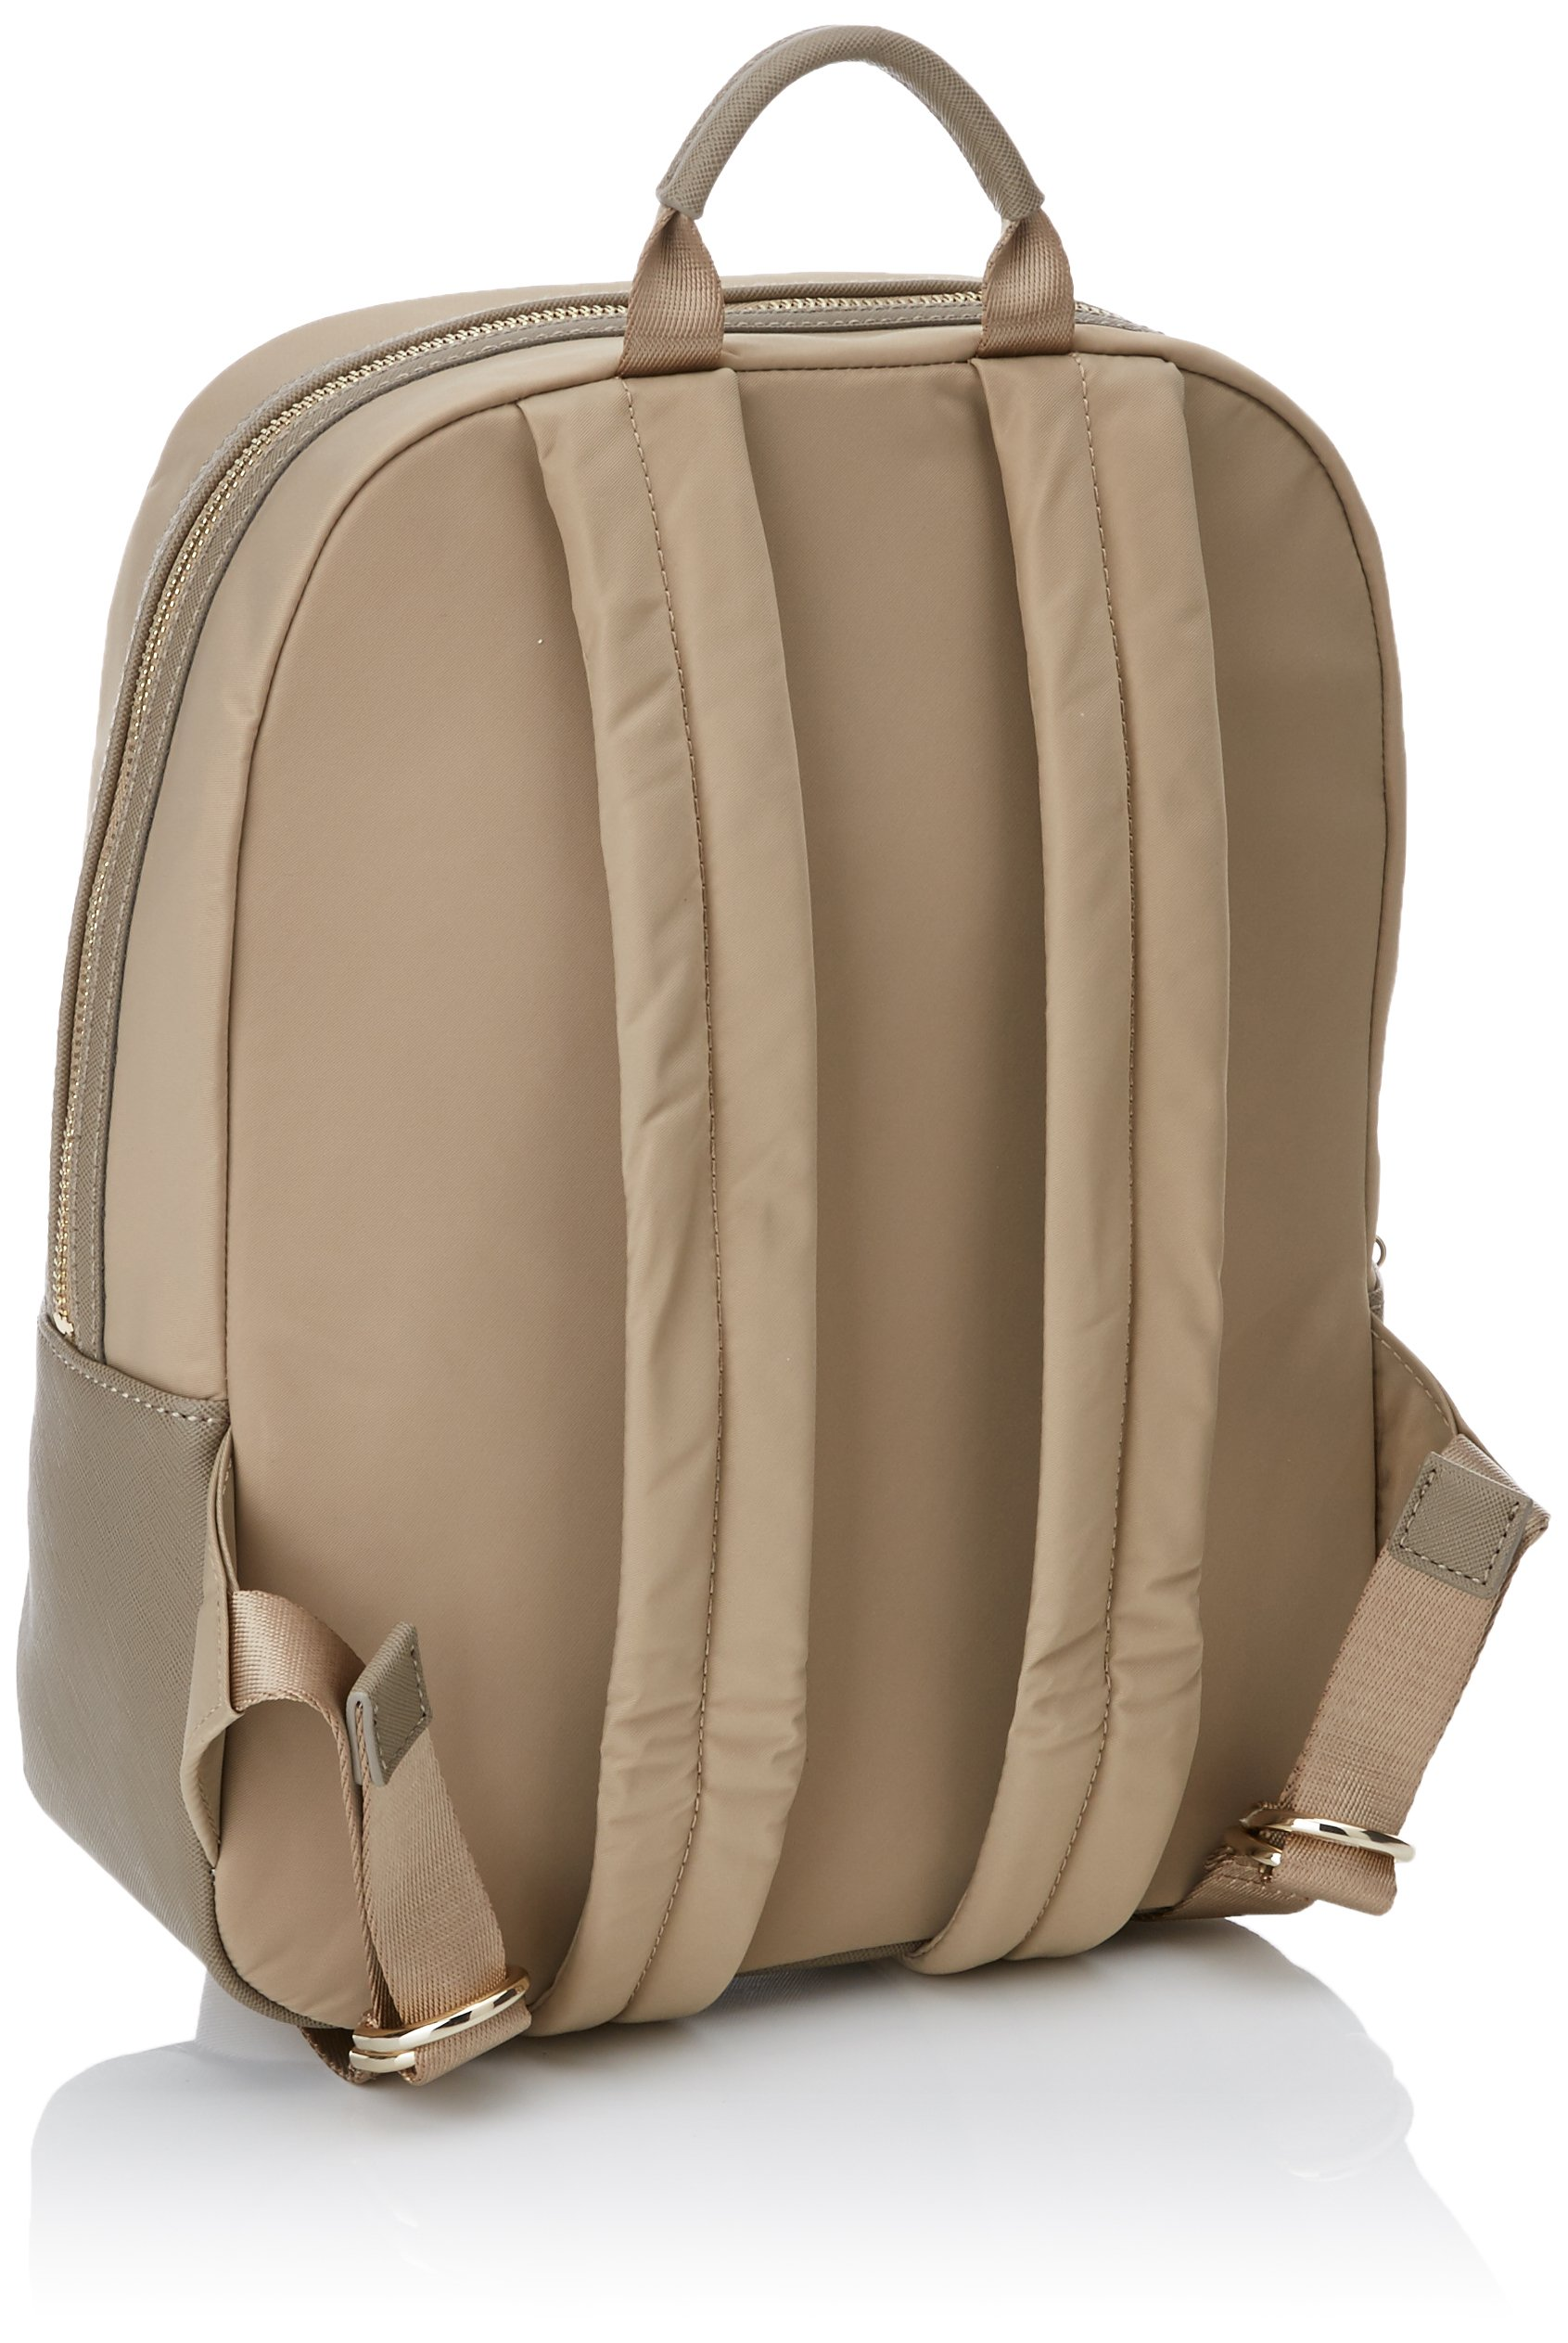 81k31OrhOvL - Tous 695810088, Bolso mochila para Mujer, Beige (Topo), 26x33x9.5 cm (W x H x L)